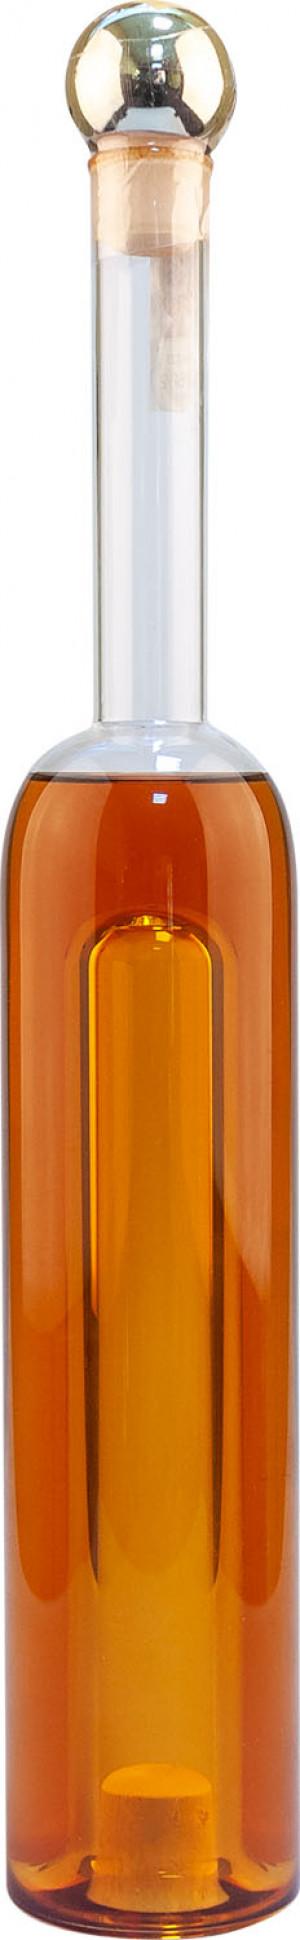 Flasche Havanna - Cygaro